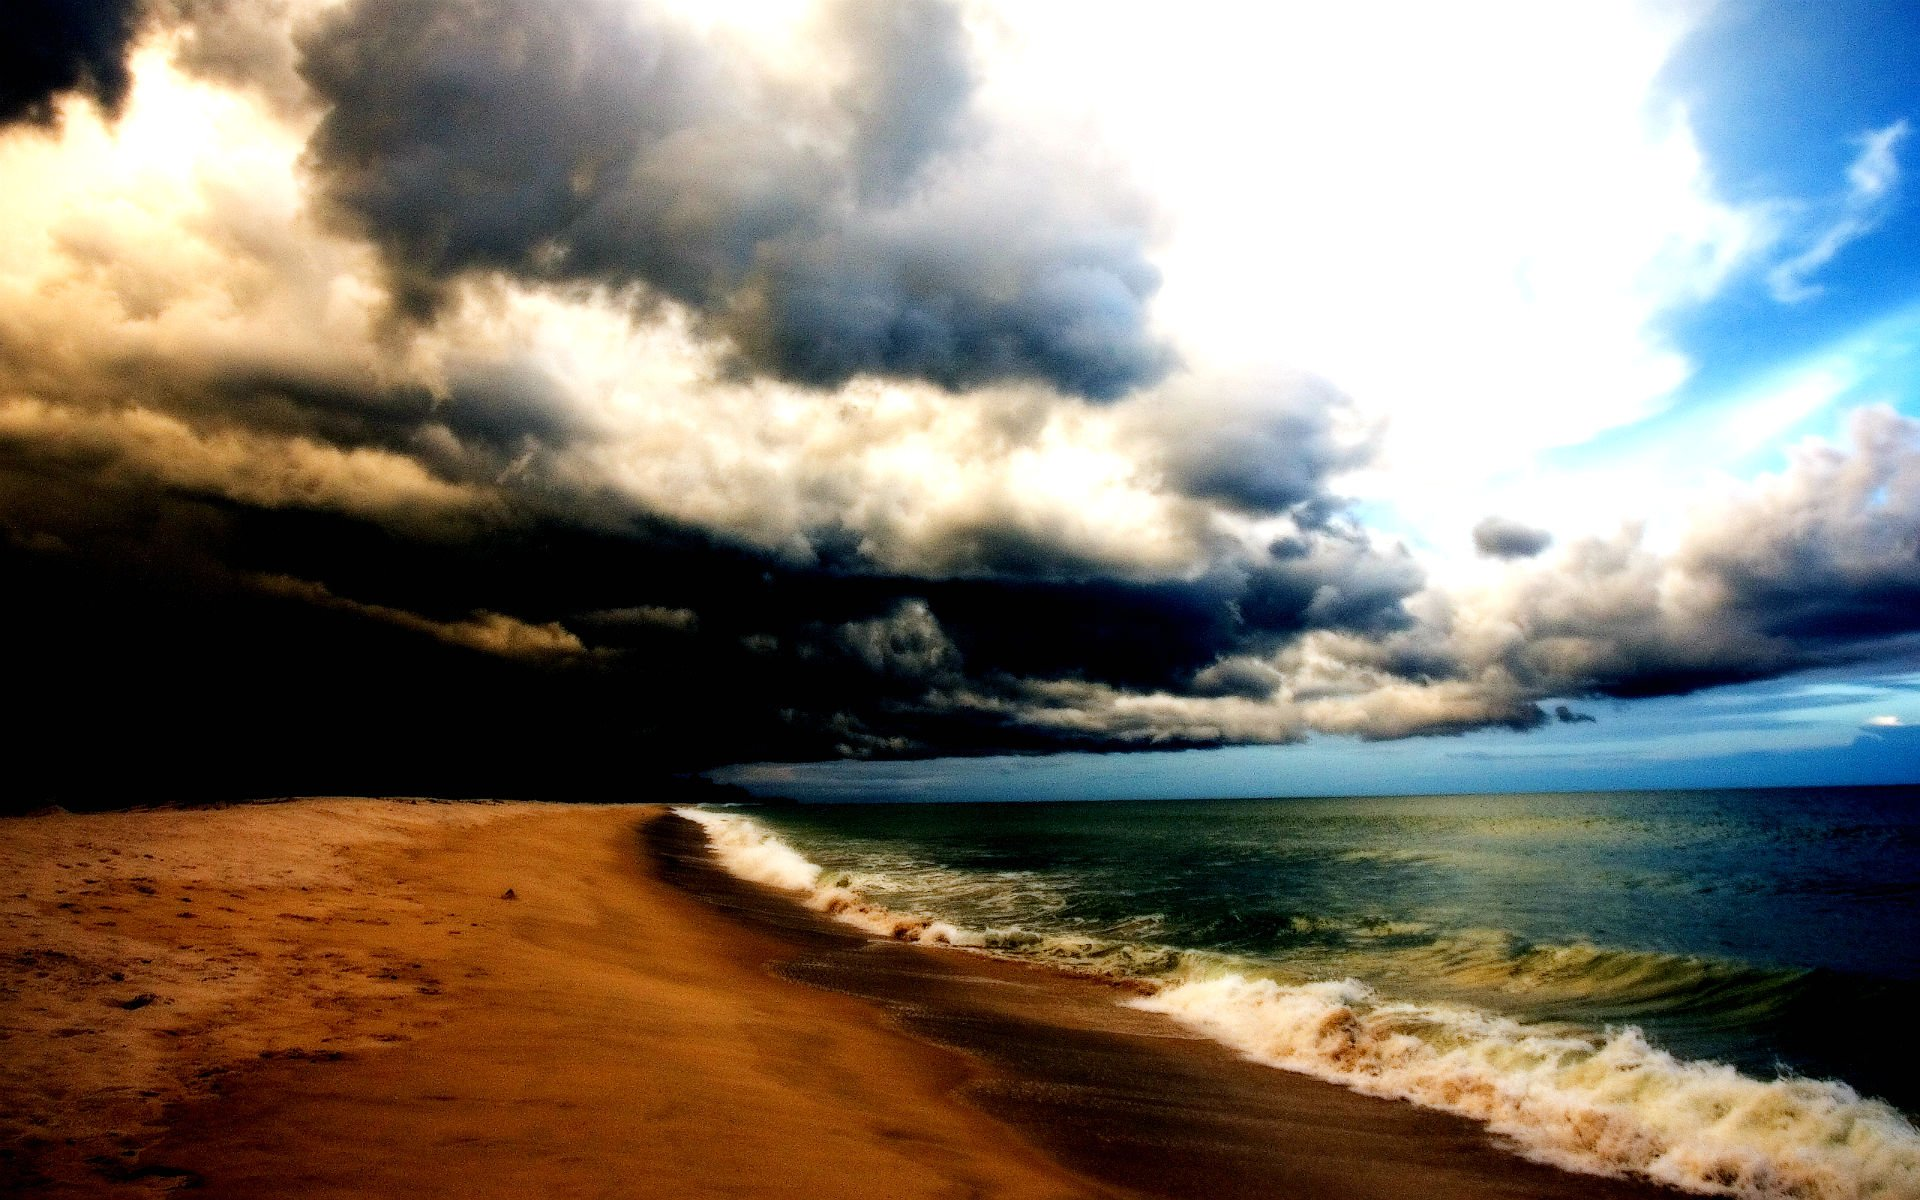 Beach Thunderstorm Wallpaper: STORM Weather Rain Sky Clouds Nature Sea Ocean Waves Beach